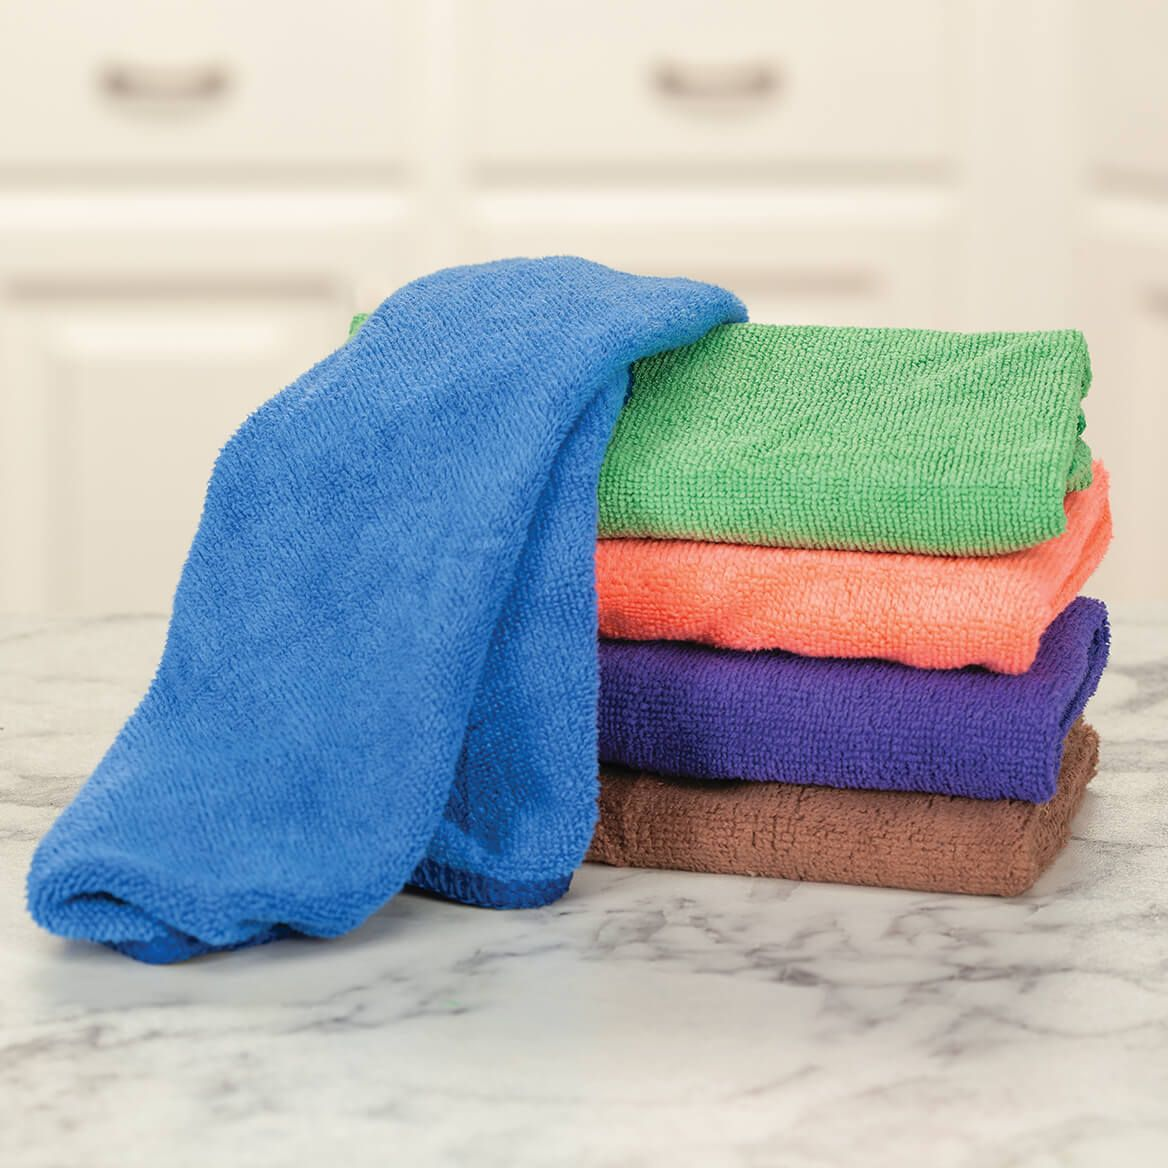 Microfiber Colorful Dishcloths Set of 5-371280